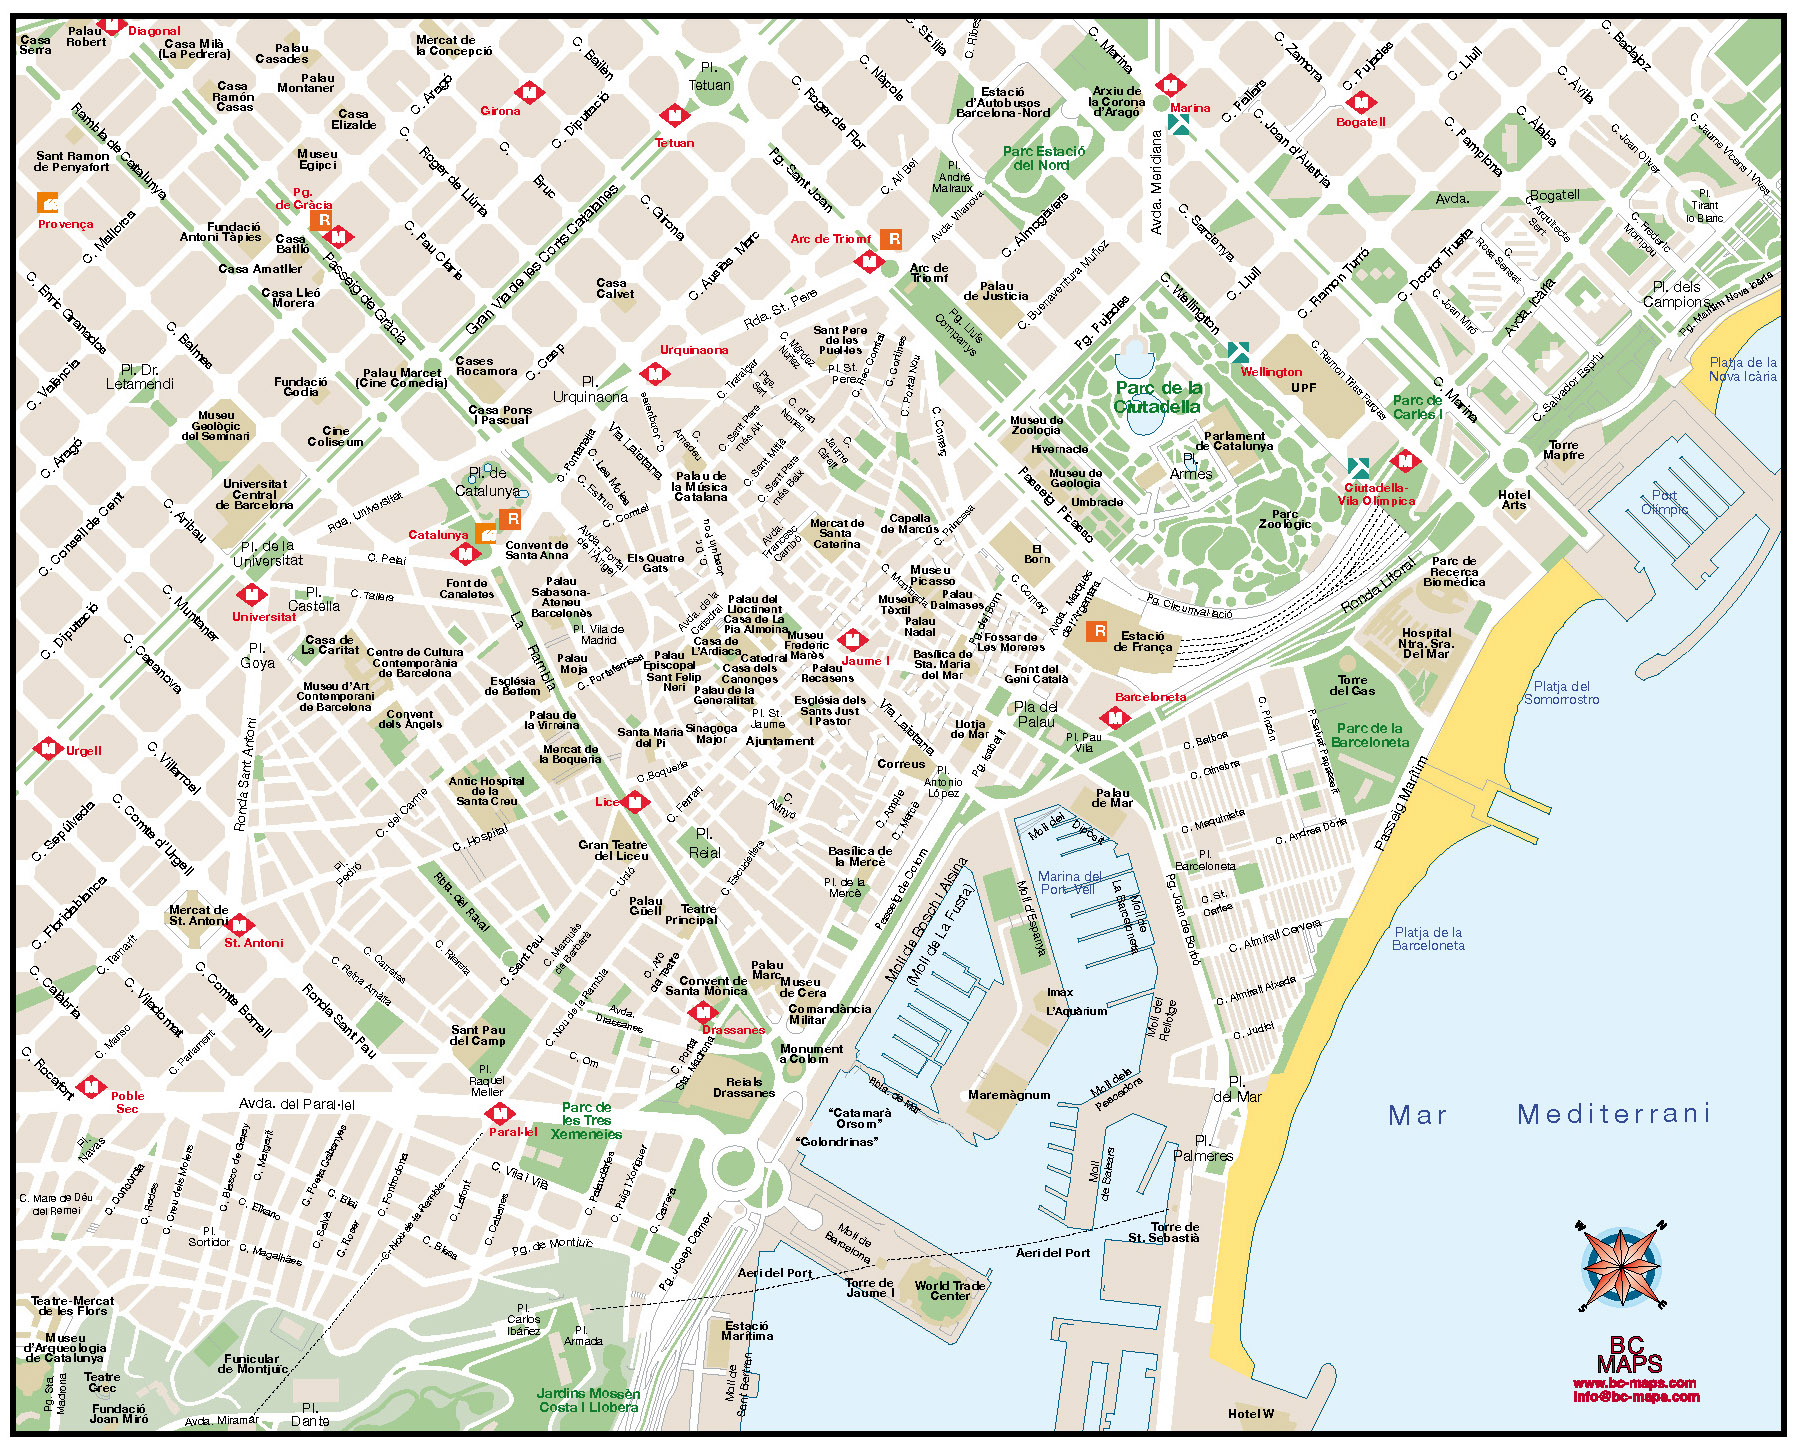 Mapa vectorial illustrator eps Barcelona Centro Esade